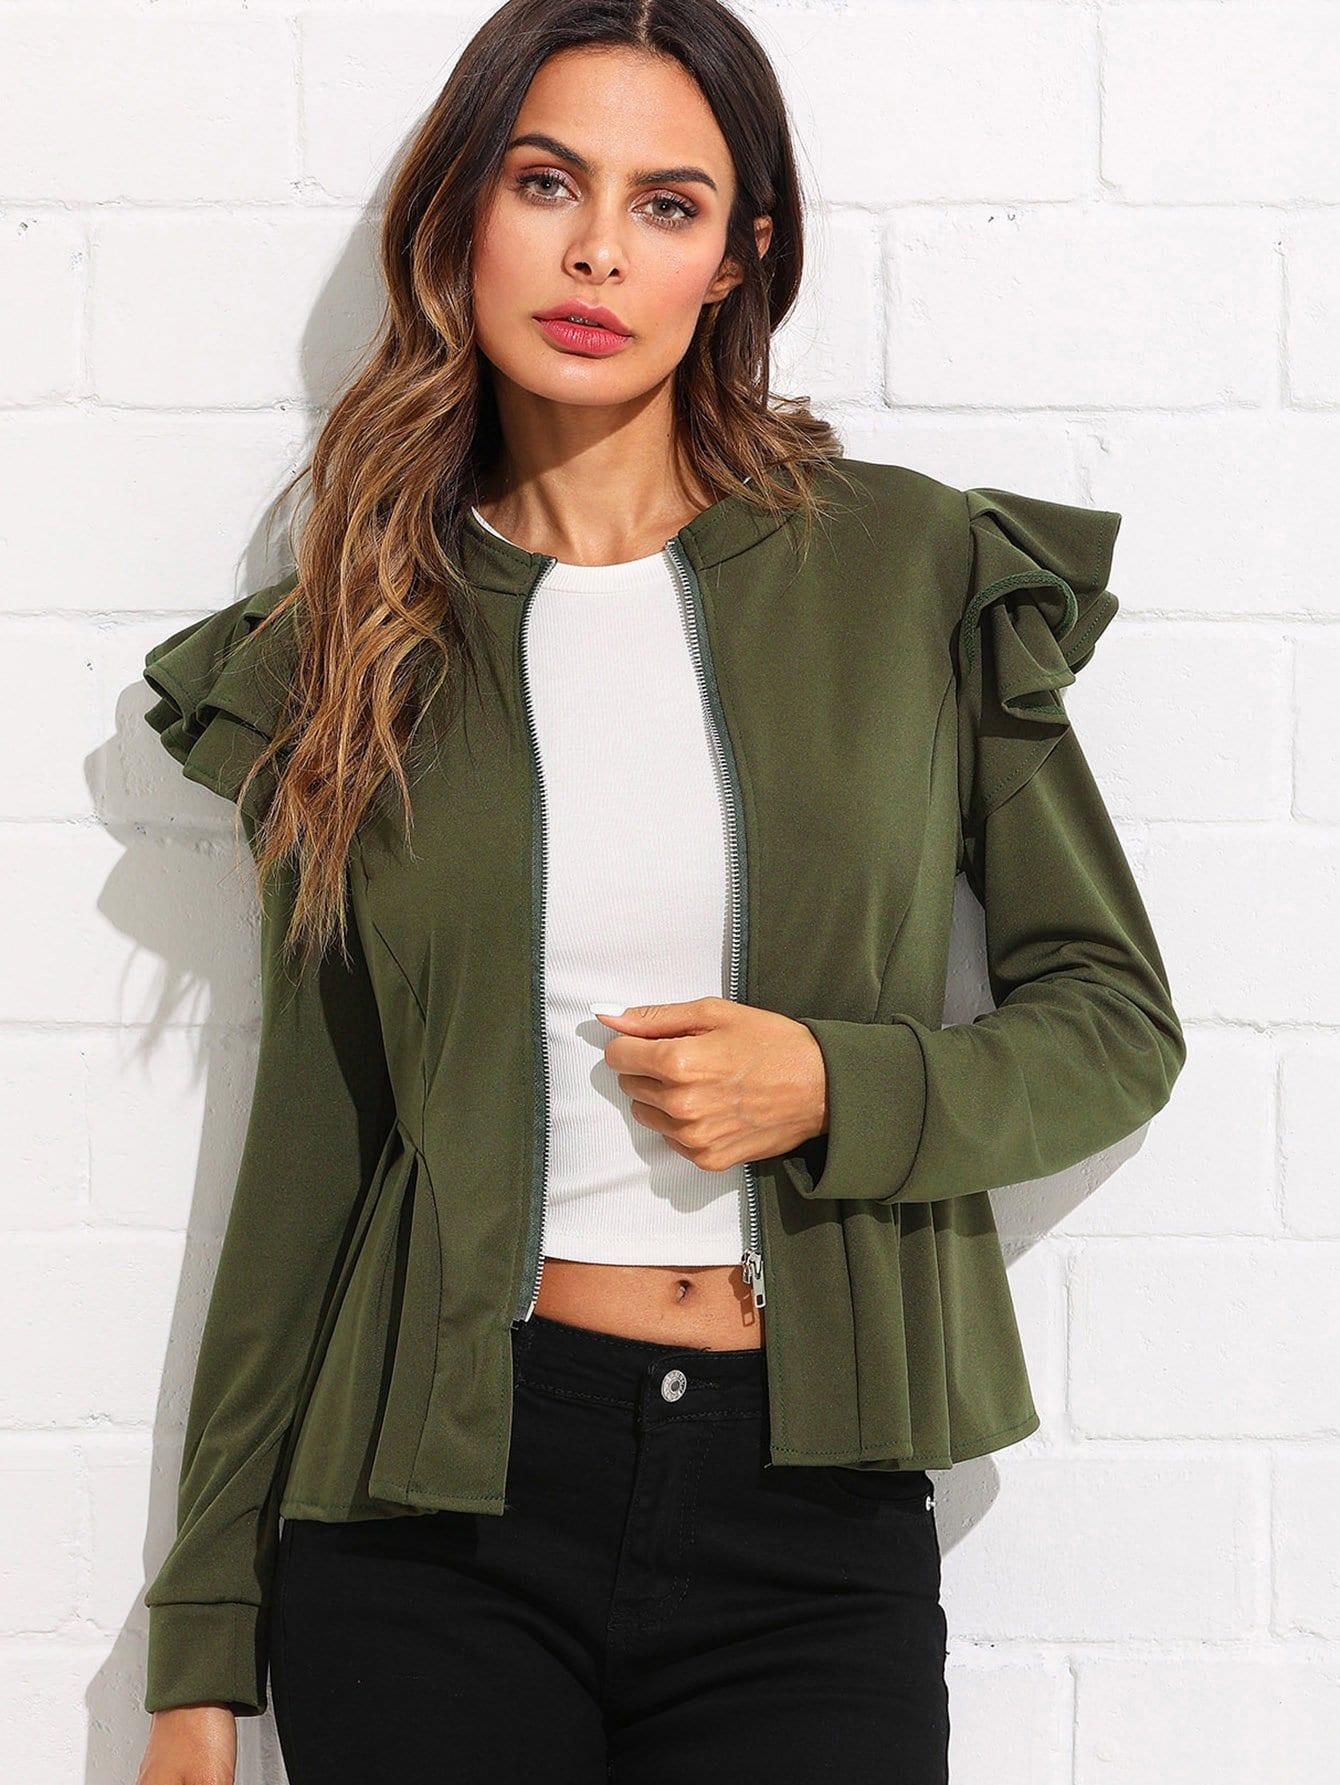 Tiered Ruffle Trim Jacket tiered layer ruffle jacket